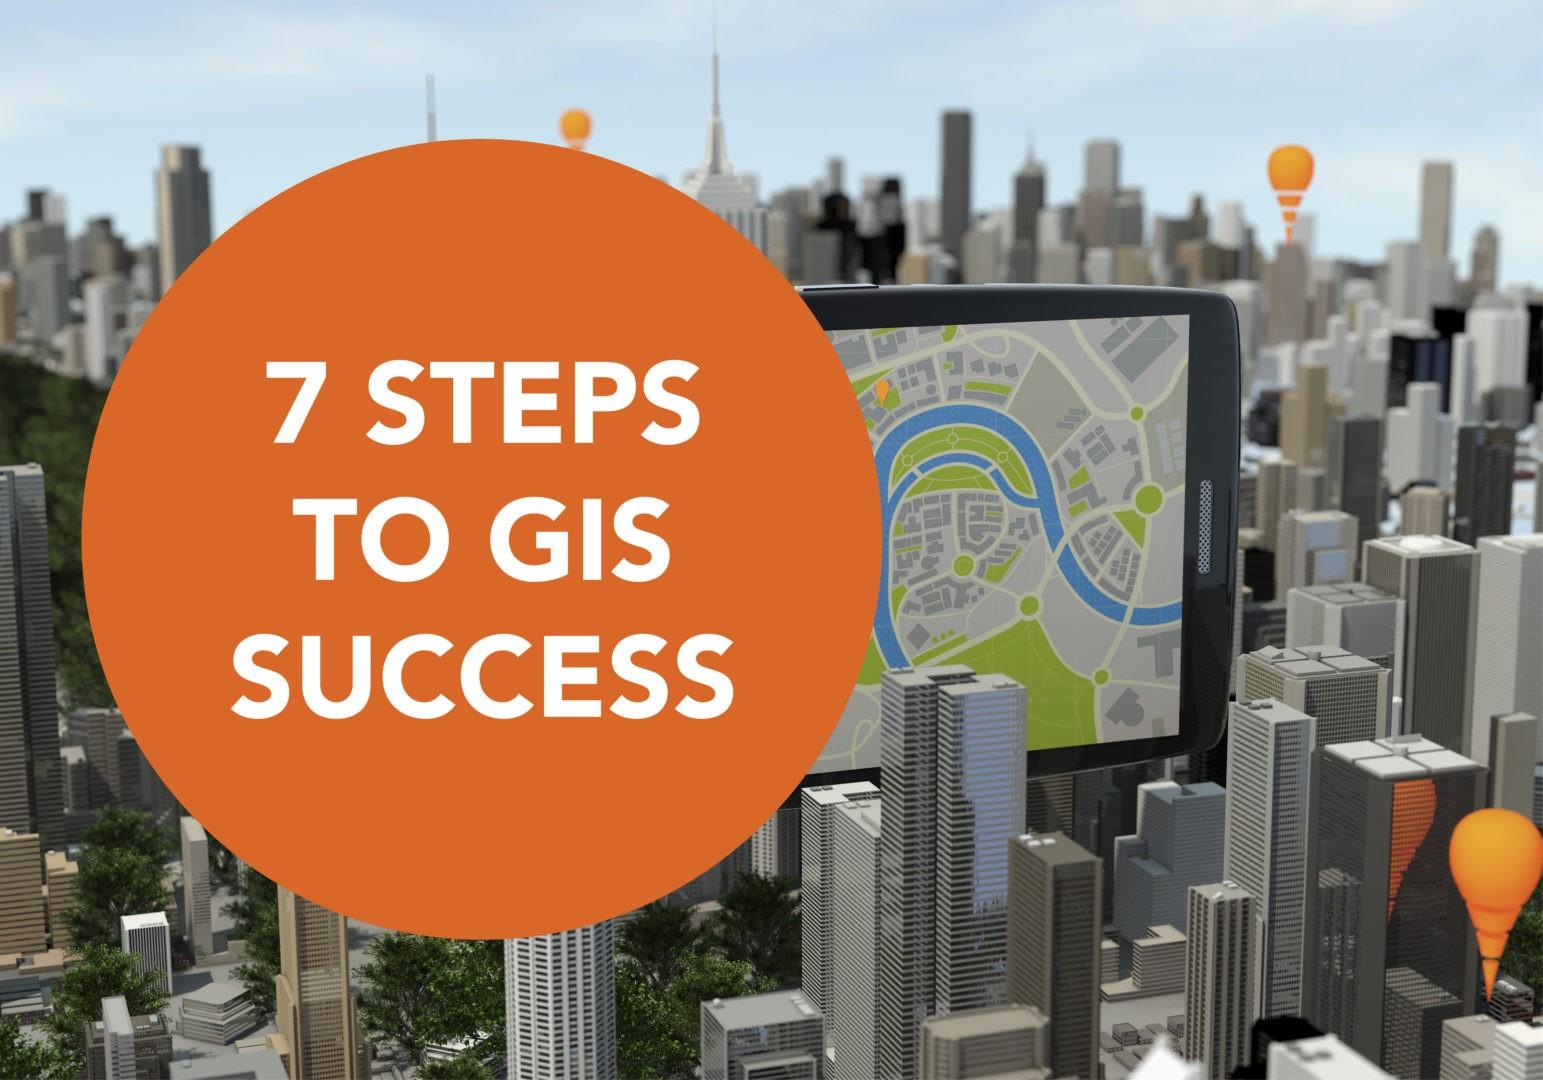 7 Steps to GIS Success